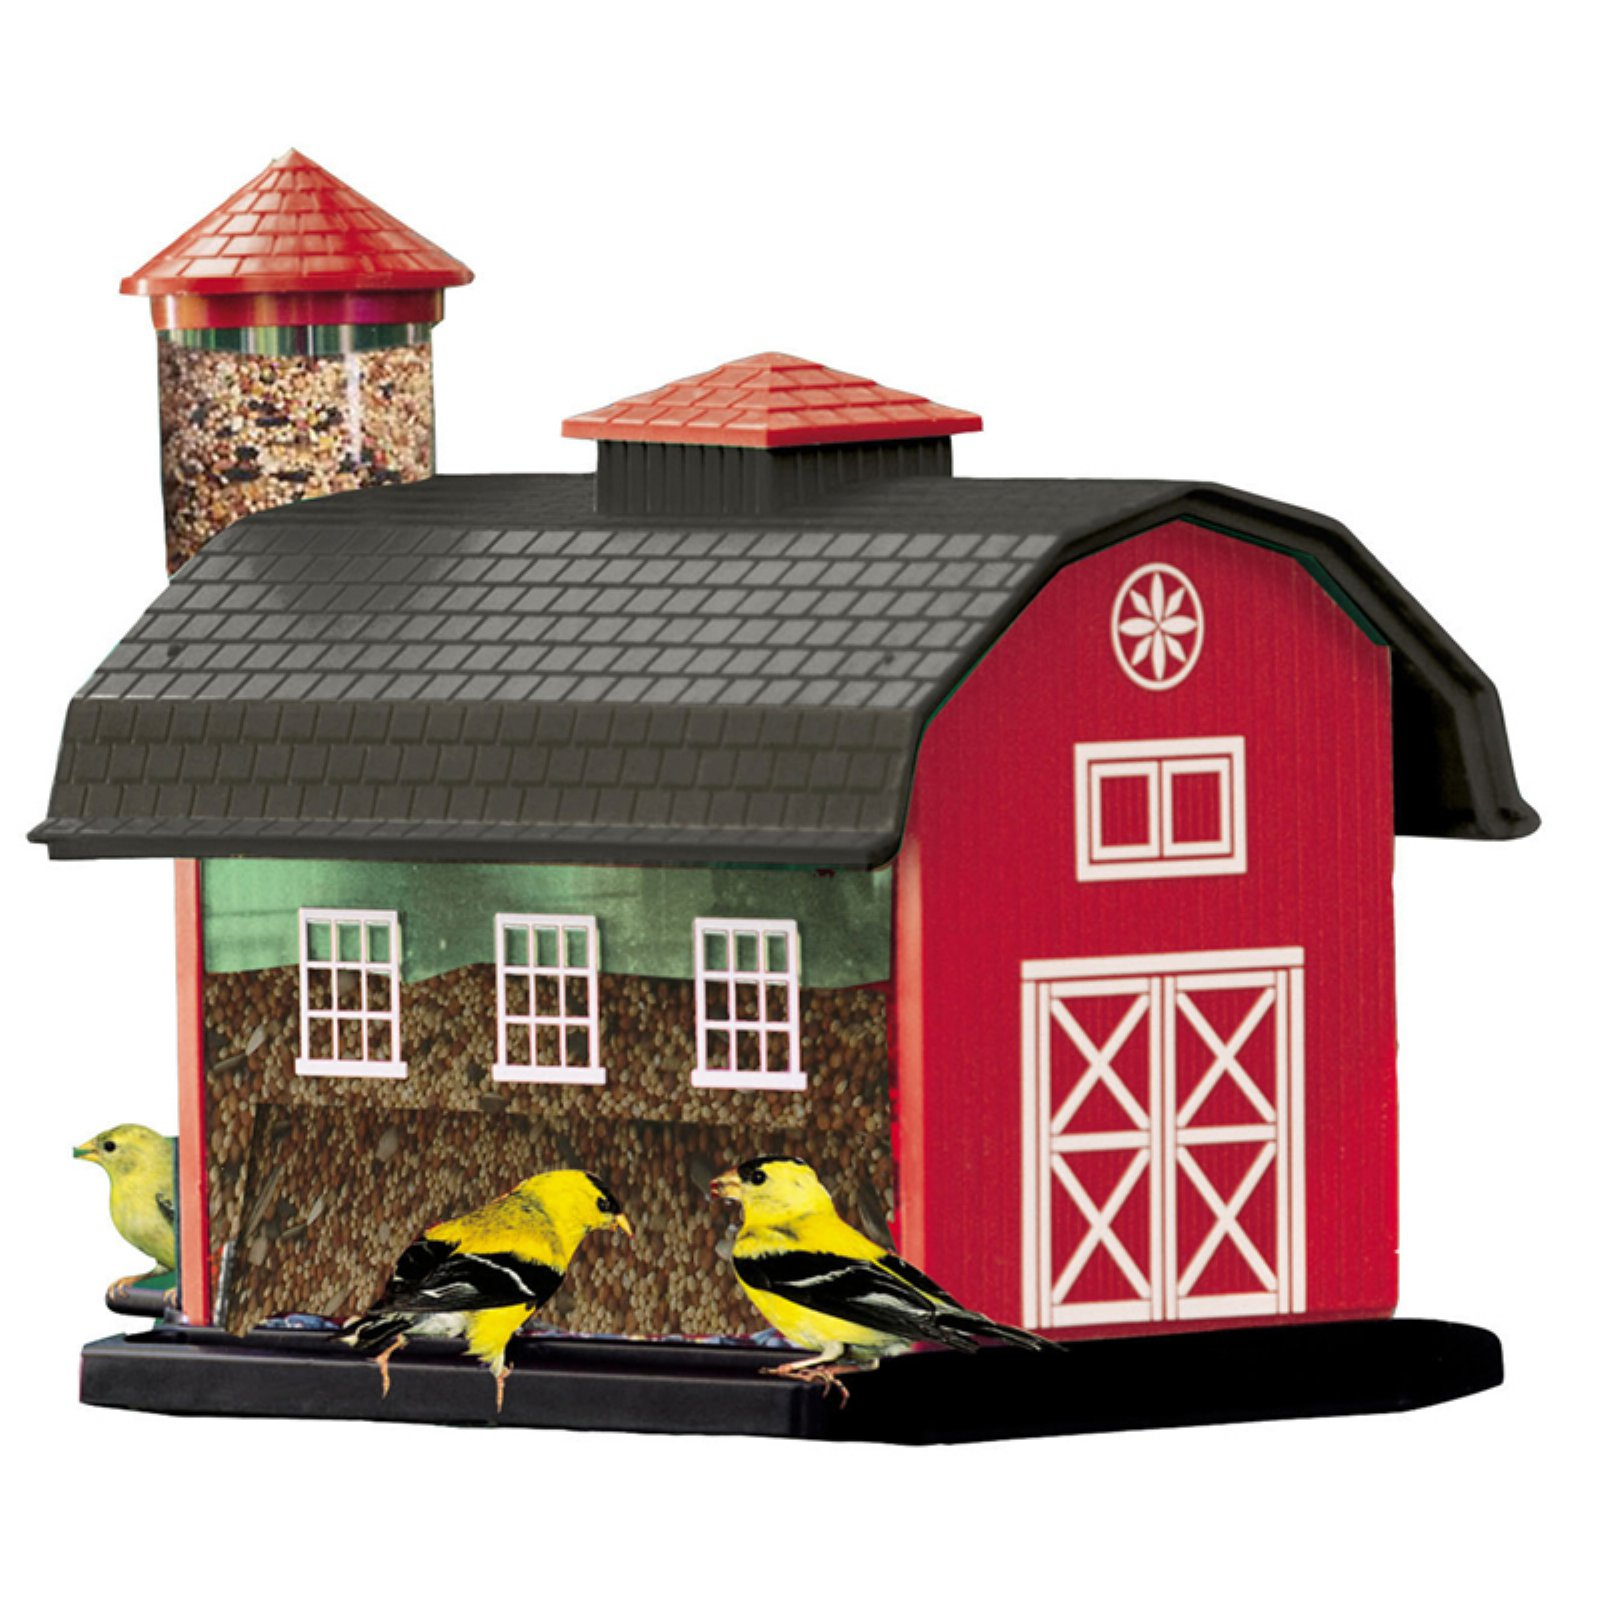 Audubon 6290 7 Lb Capacity Red Barn Combination Bird Feeder